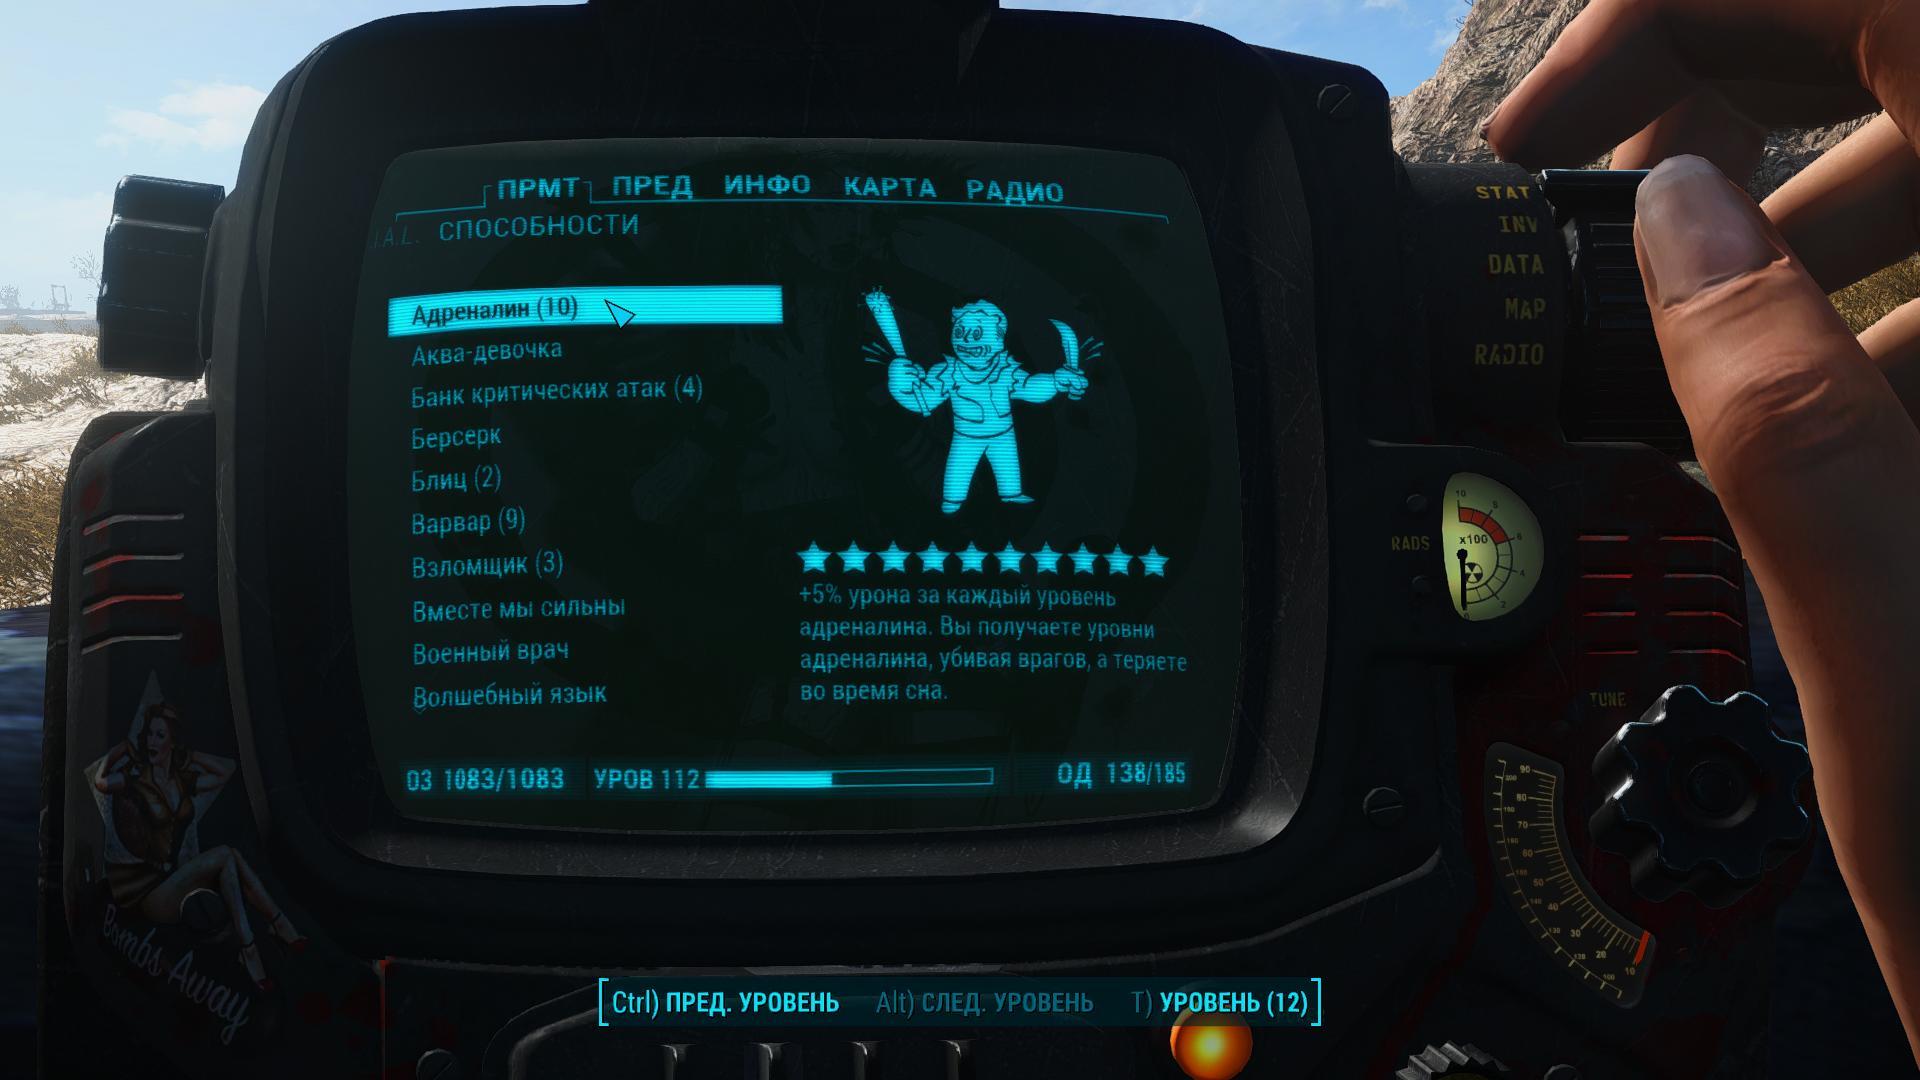 000562.Jpg - Fallout 4